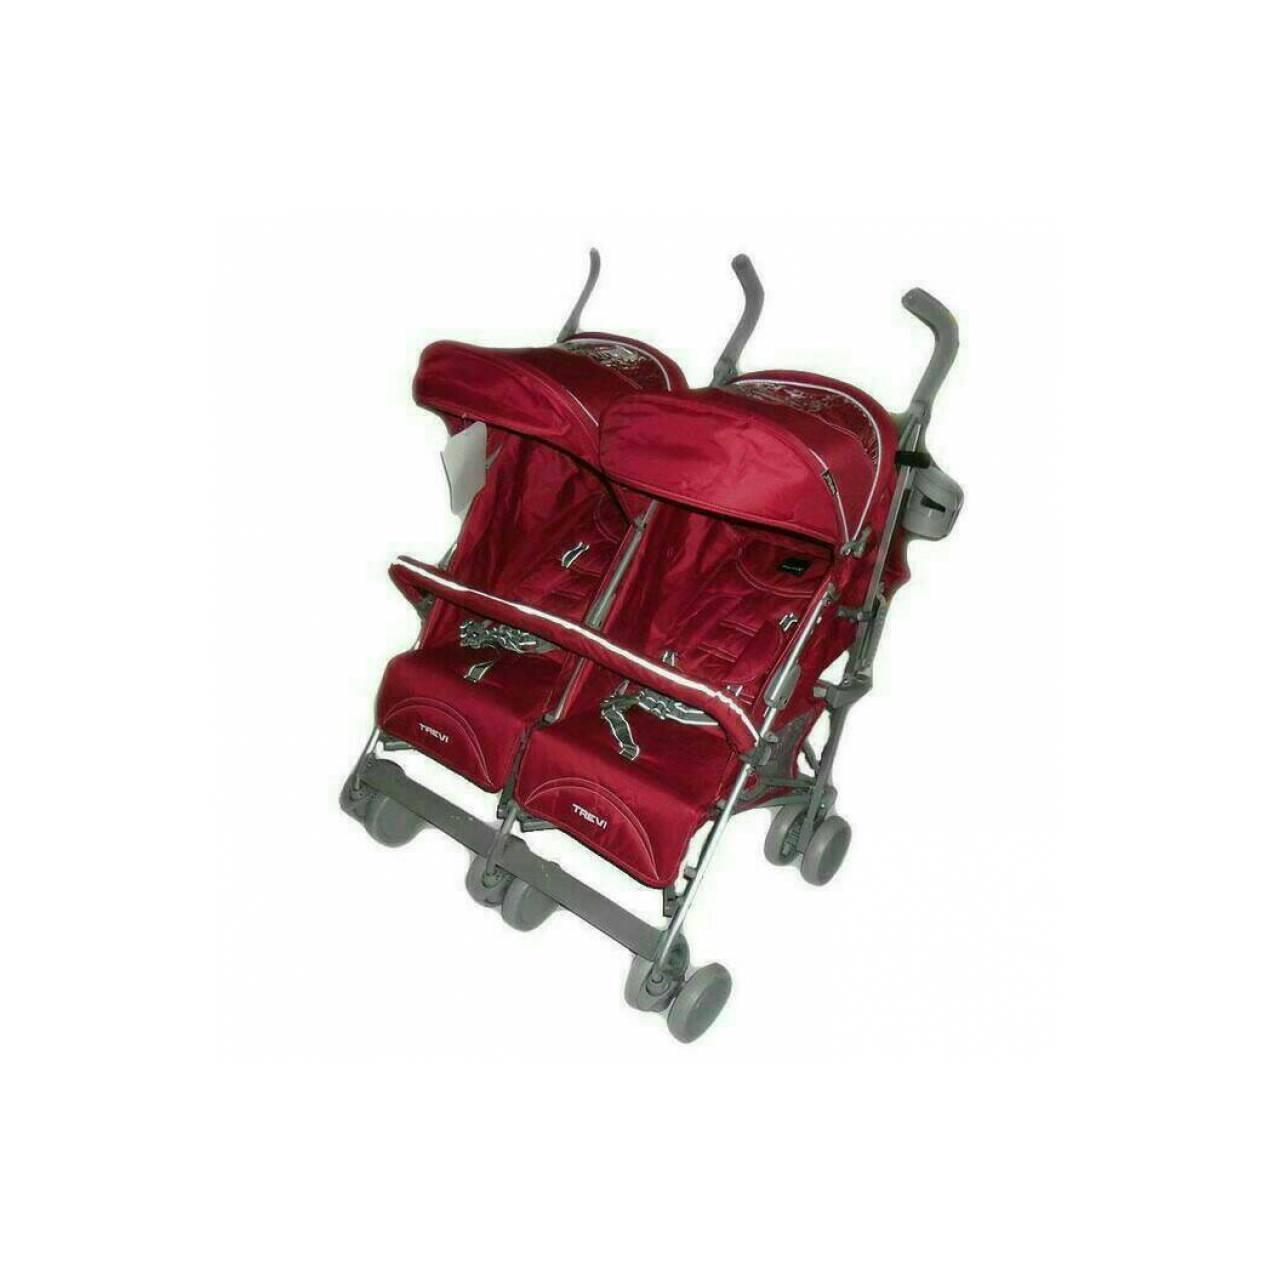 Stroller Pad Alas Isport Iflex Icross Baby Elle Wavedl Kereta Dorong002 Seatpad Strollerpad Source Twin Trevi S2500